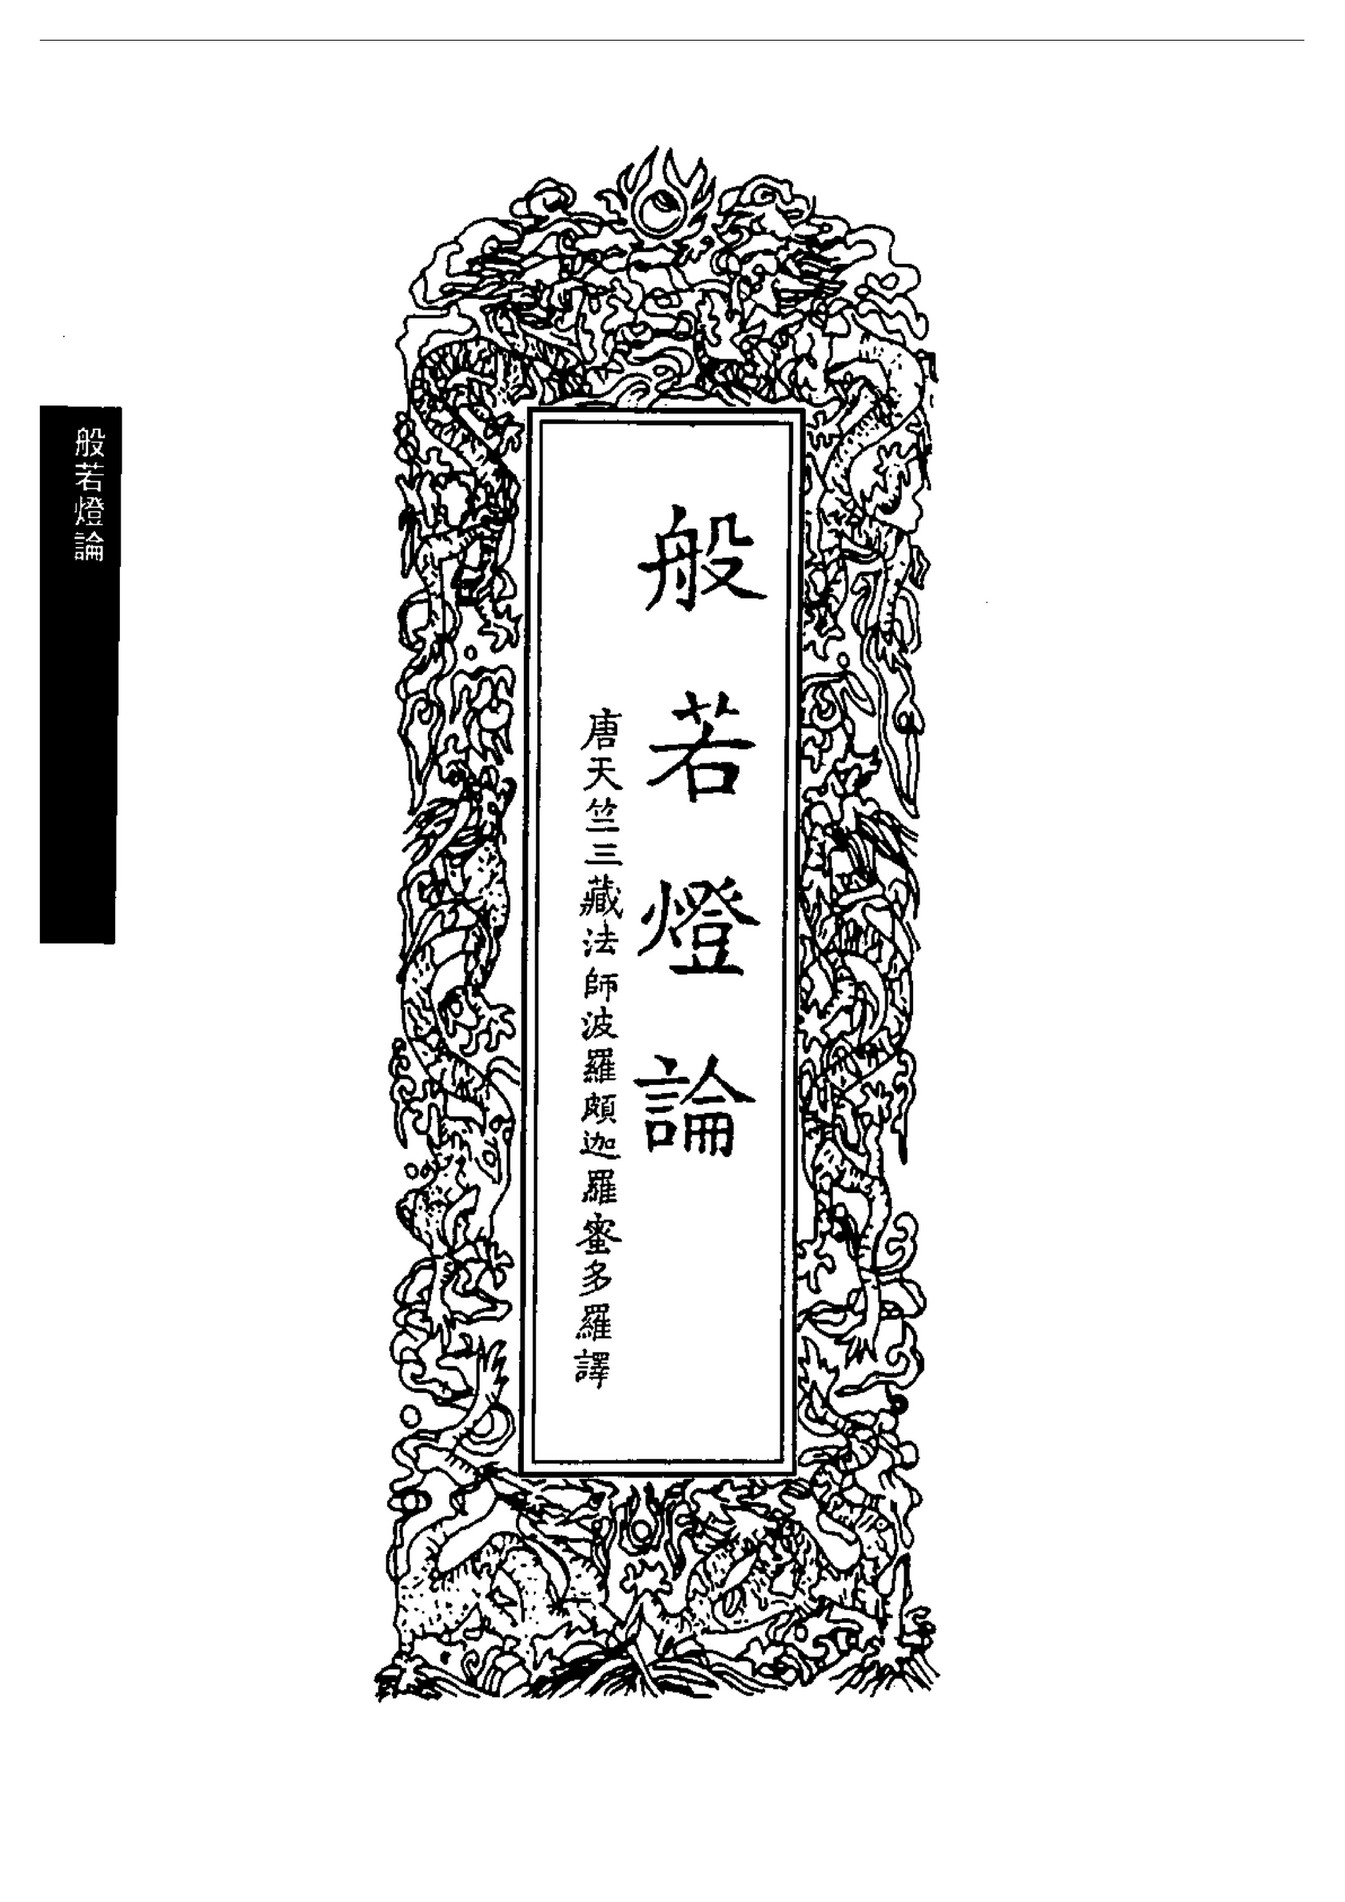 linhson - 1178 大乘論-般若燈論 -乾隆大藏經第85冊 - 頁面 1 - Created with Publitas.com